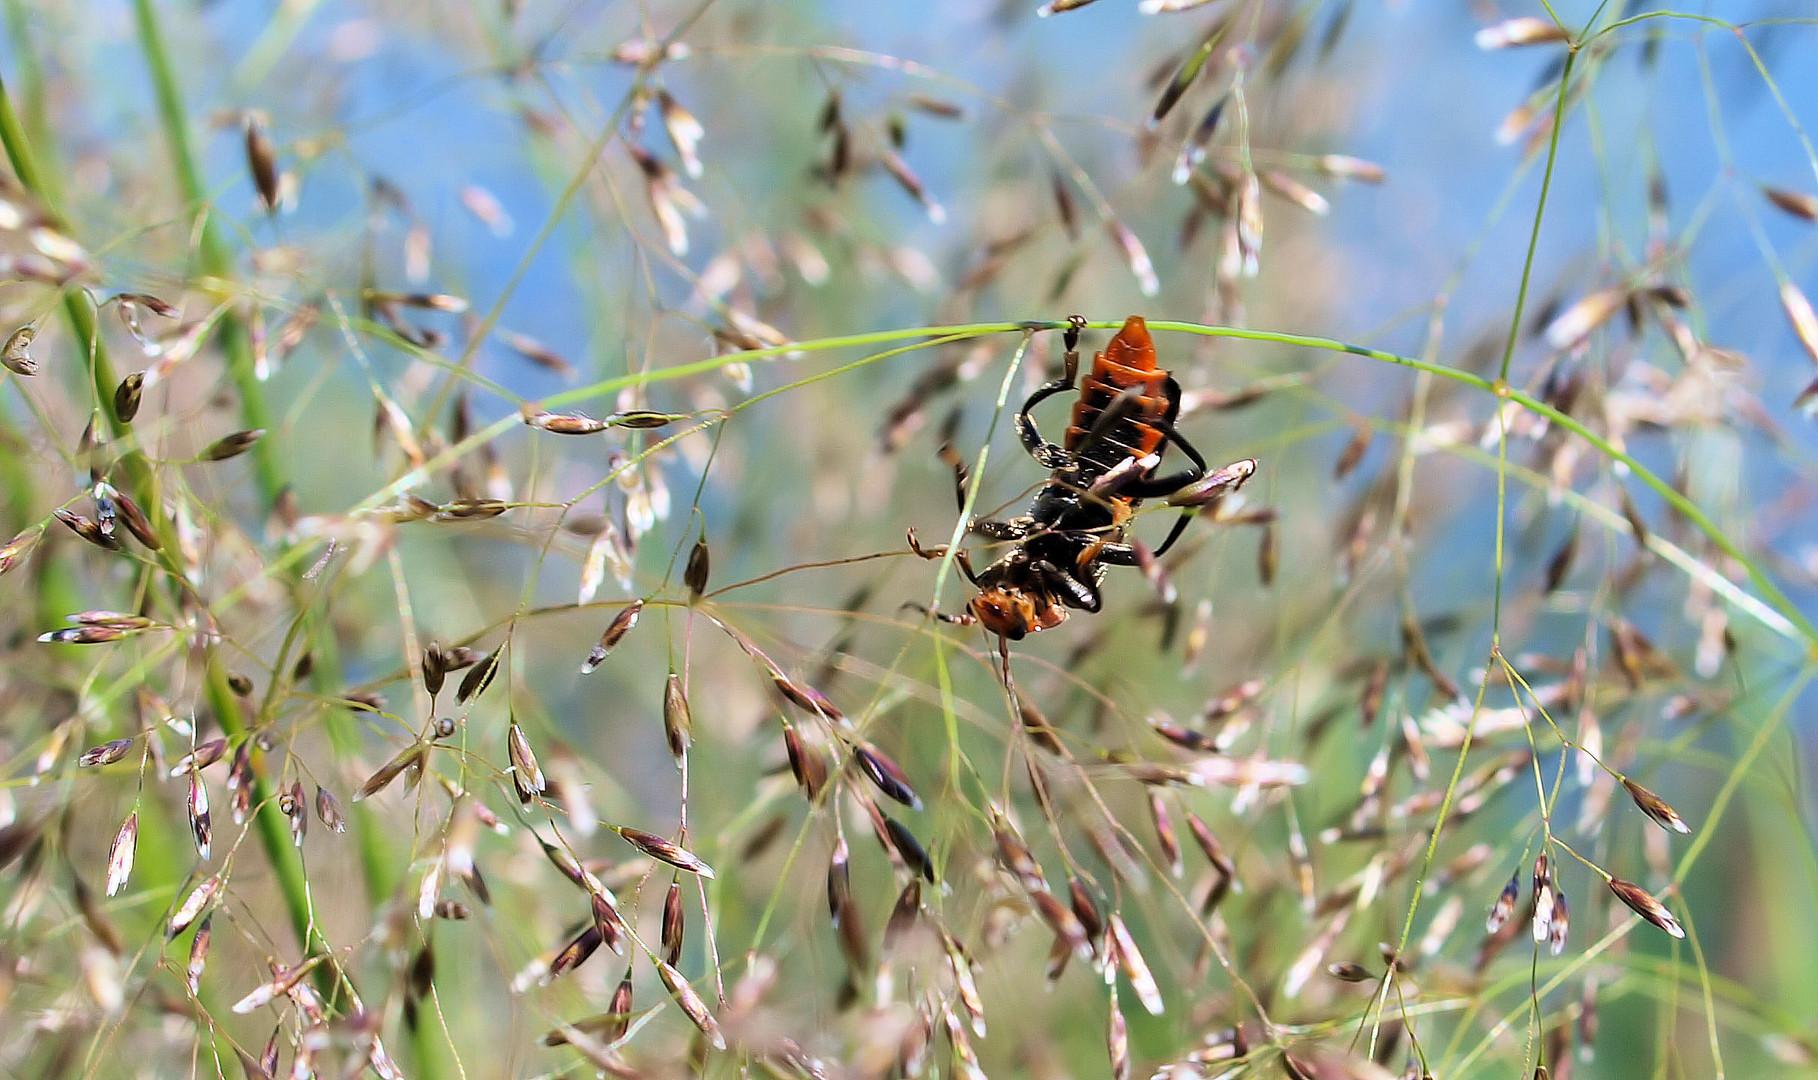 Käfer im Stress....